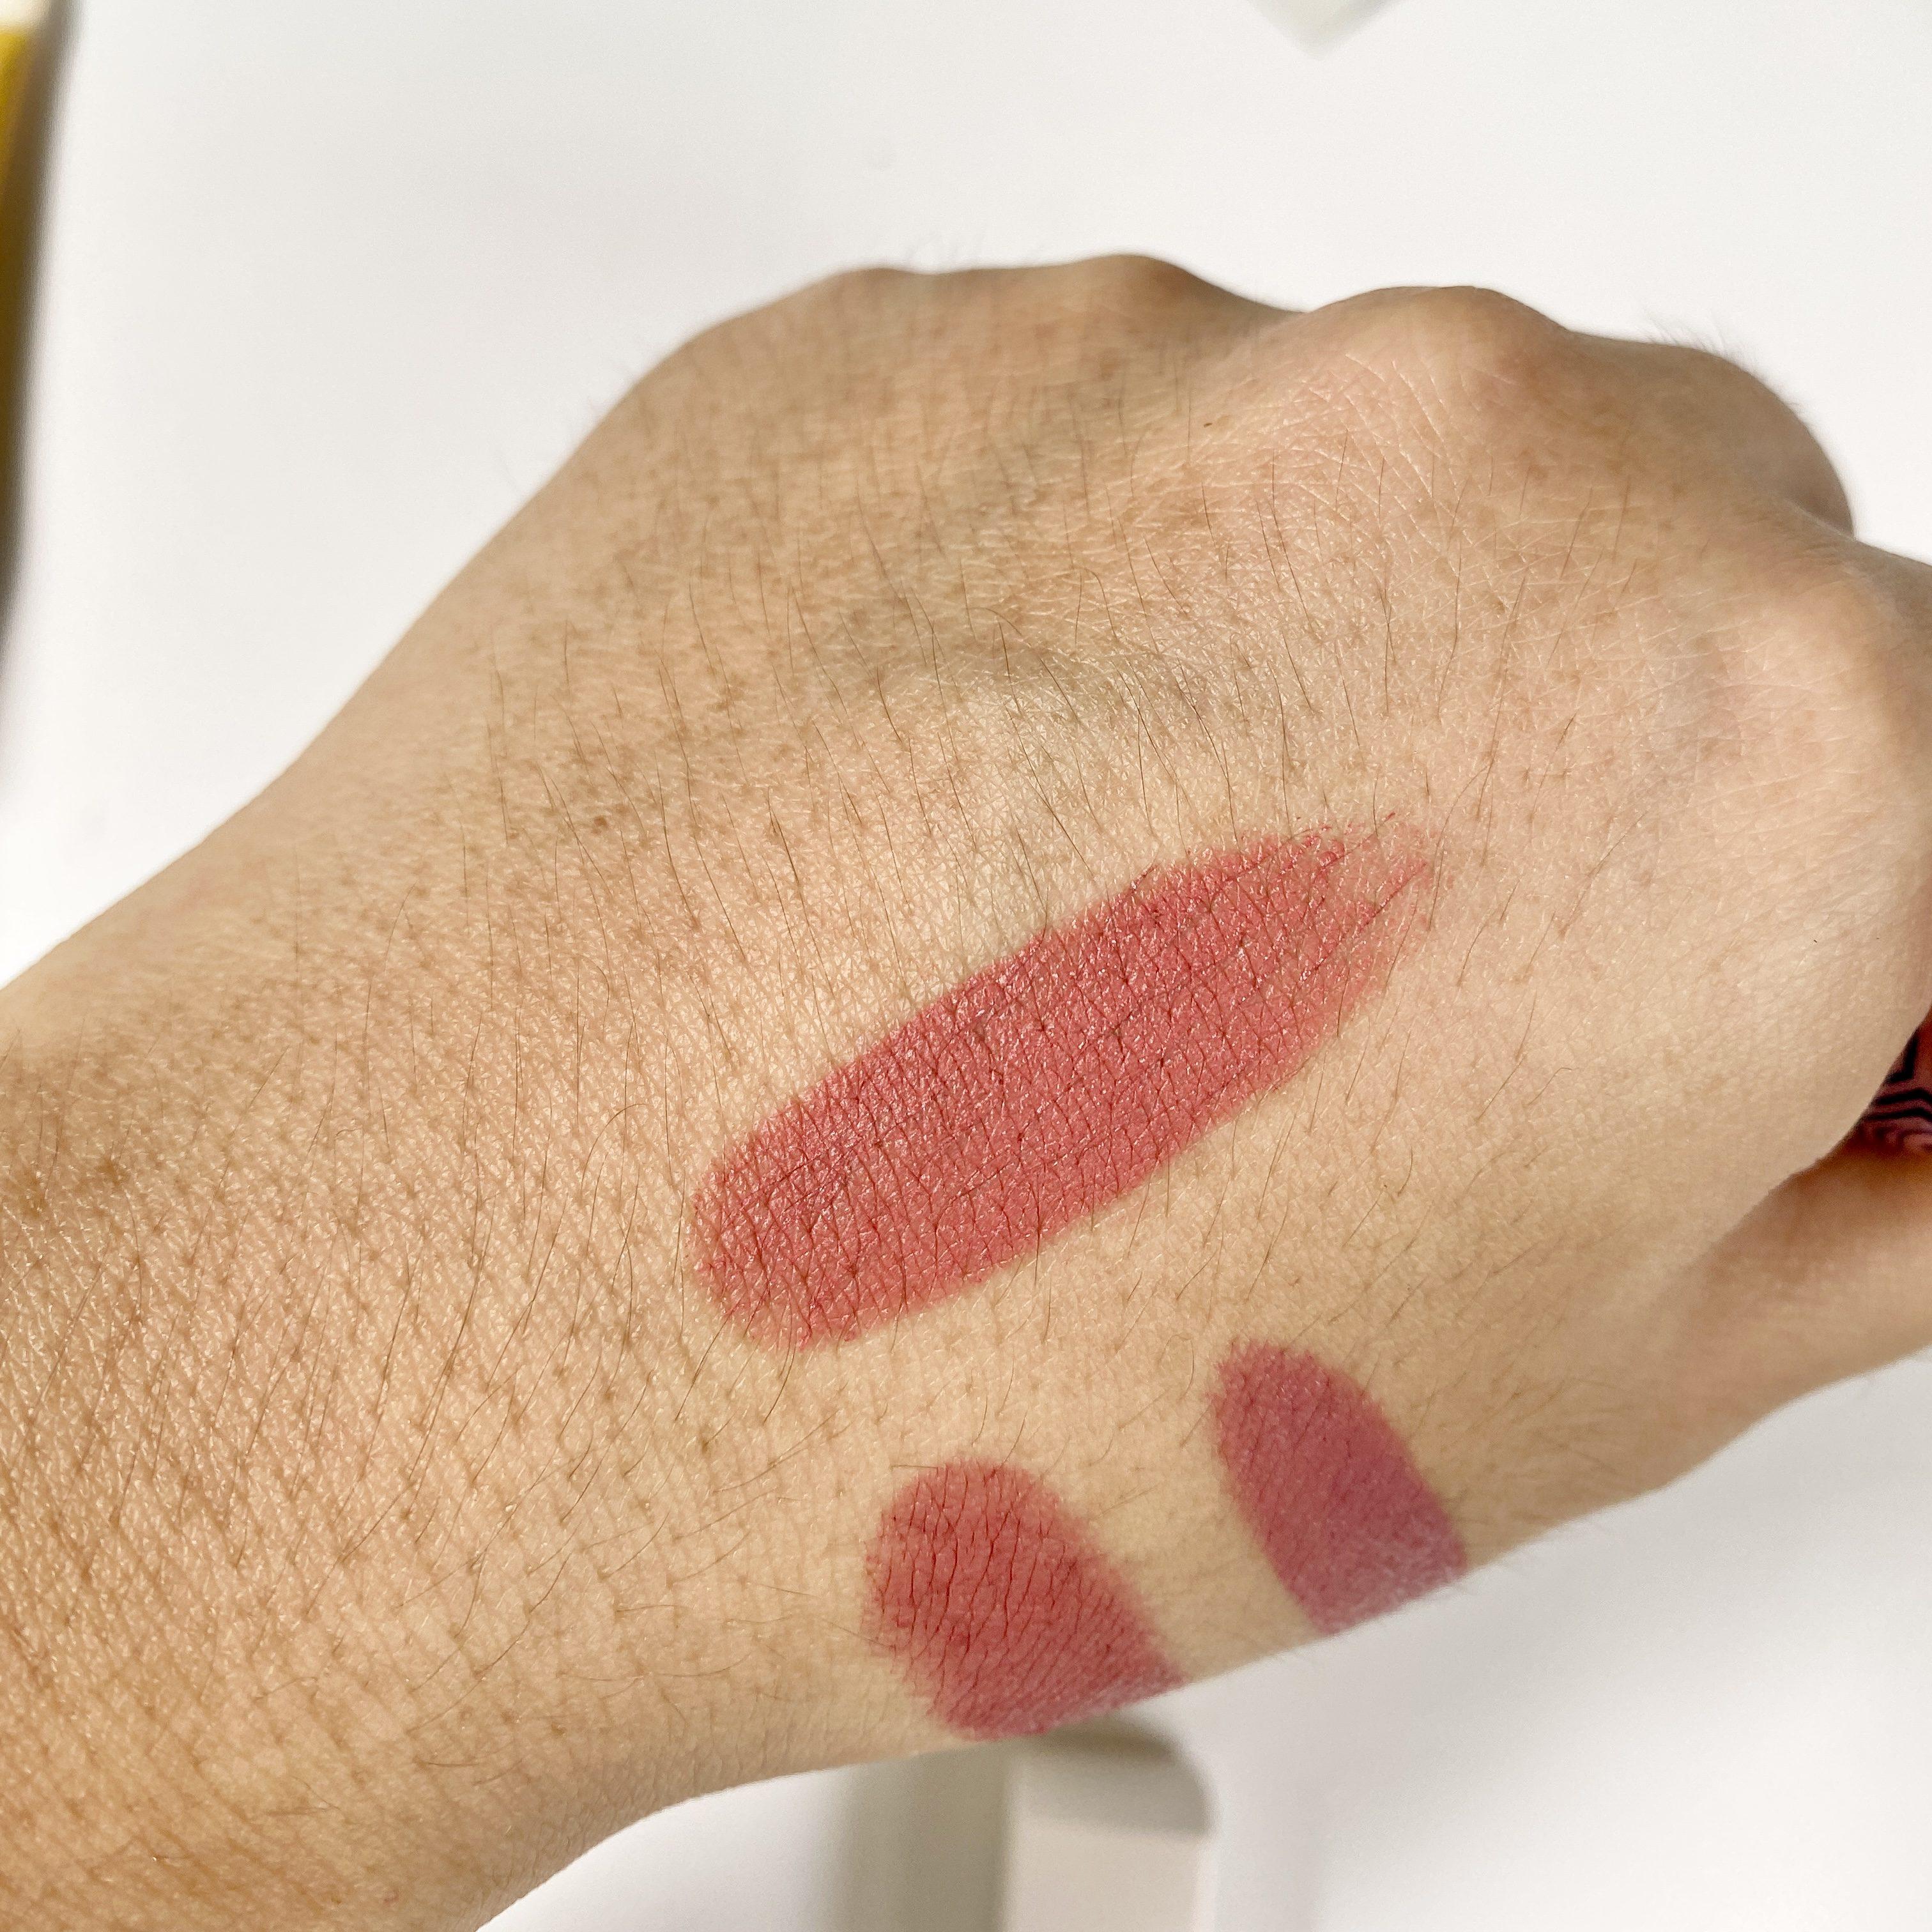 Swatching lipsticks on hand.